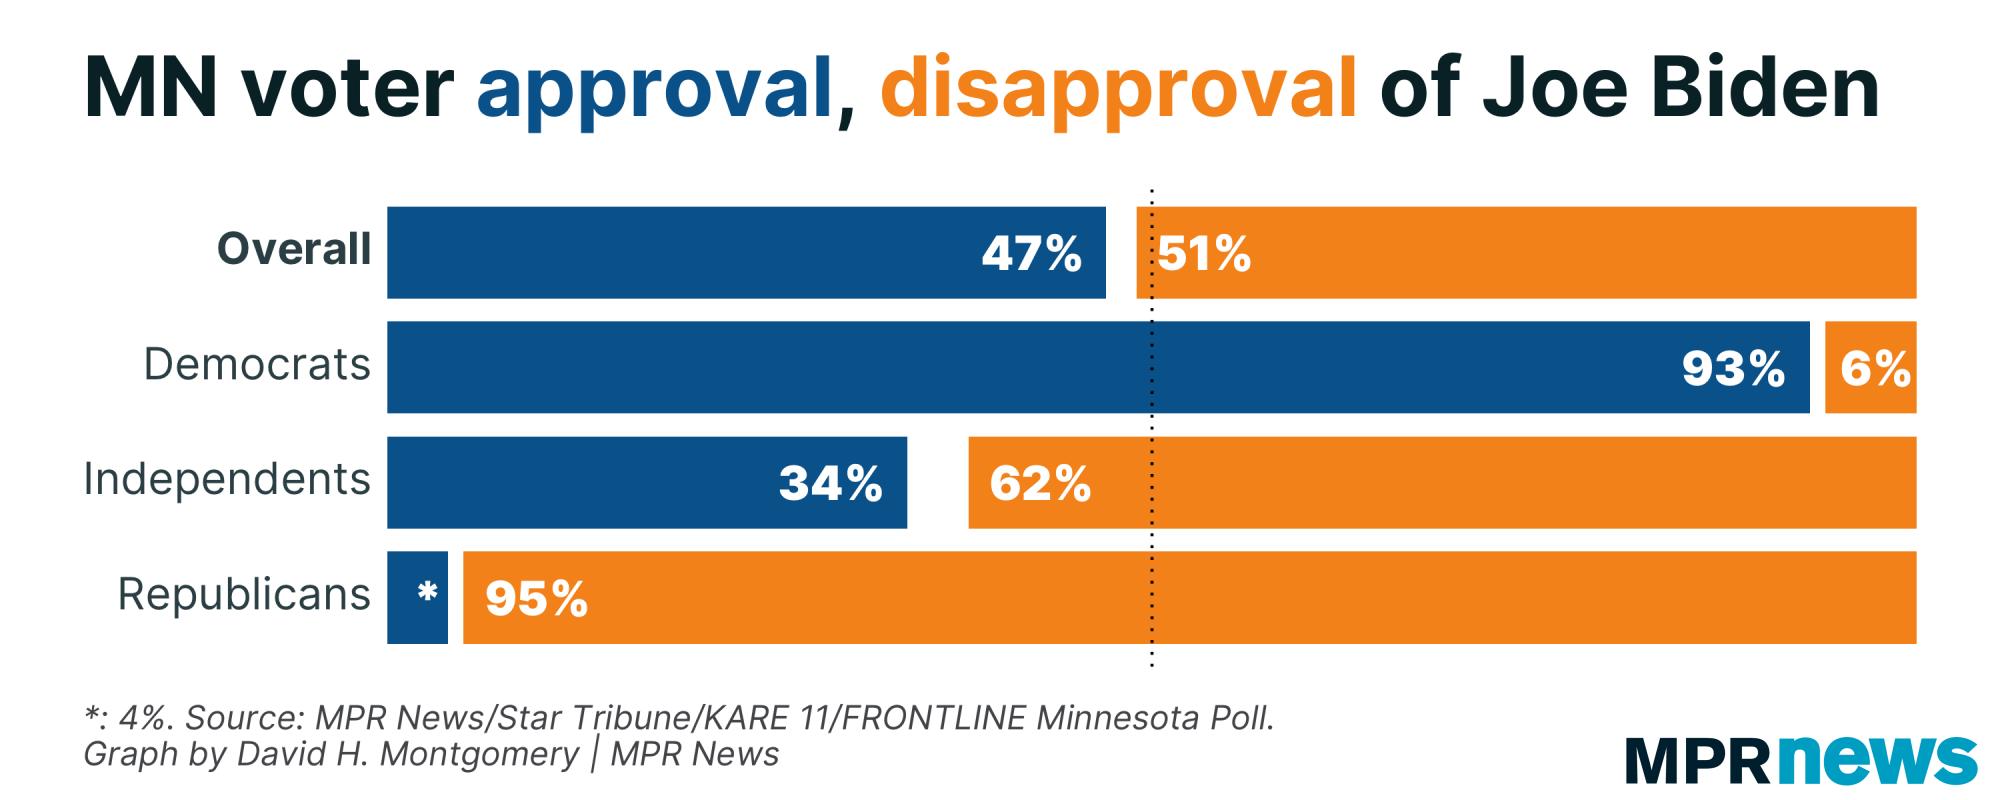 Graph of Minnesota voter approval of Joe Biden